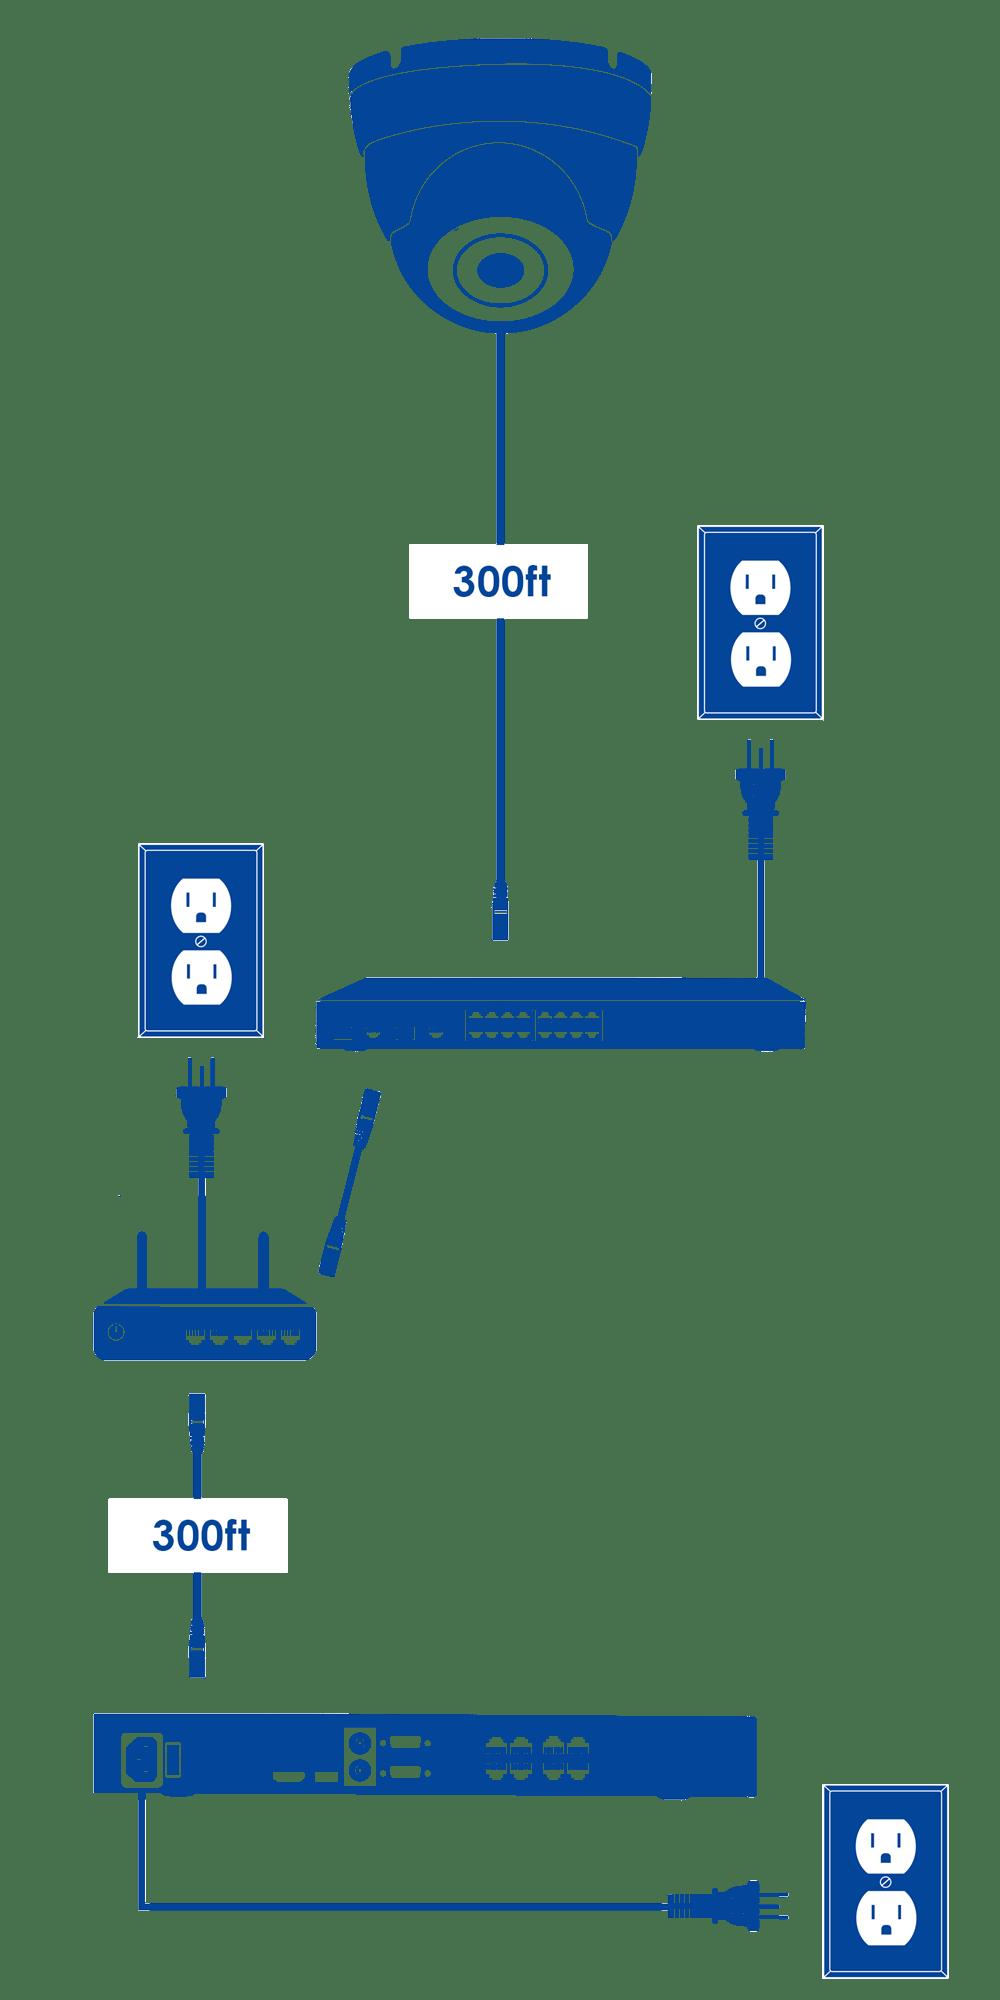 medium resolution of poe switch diagram